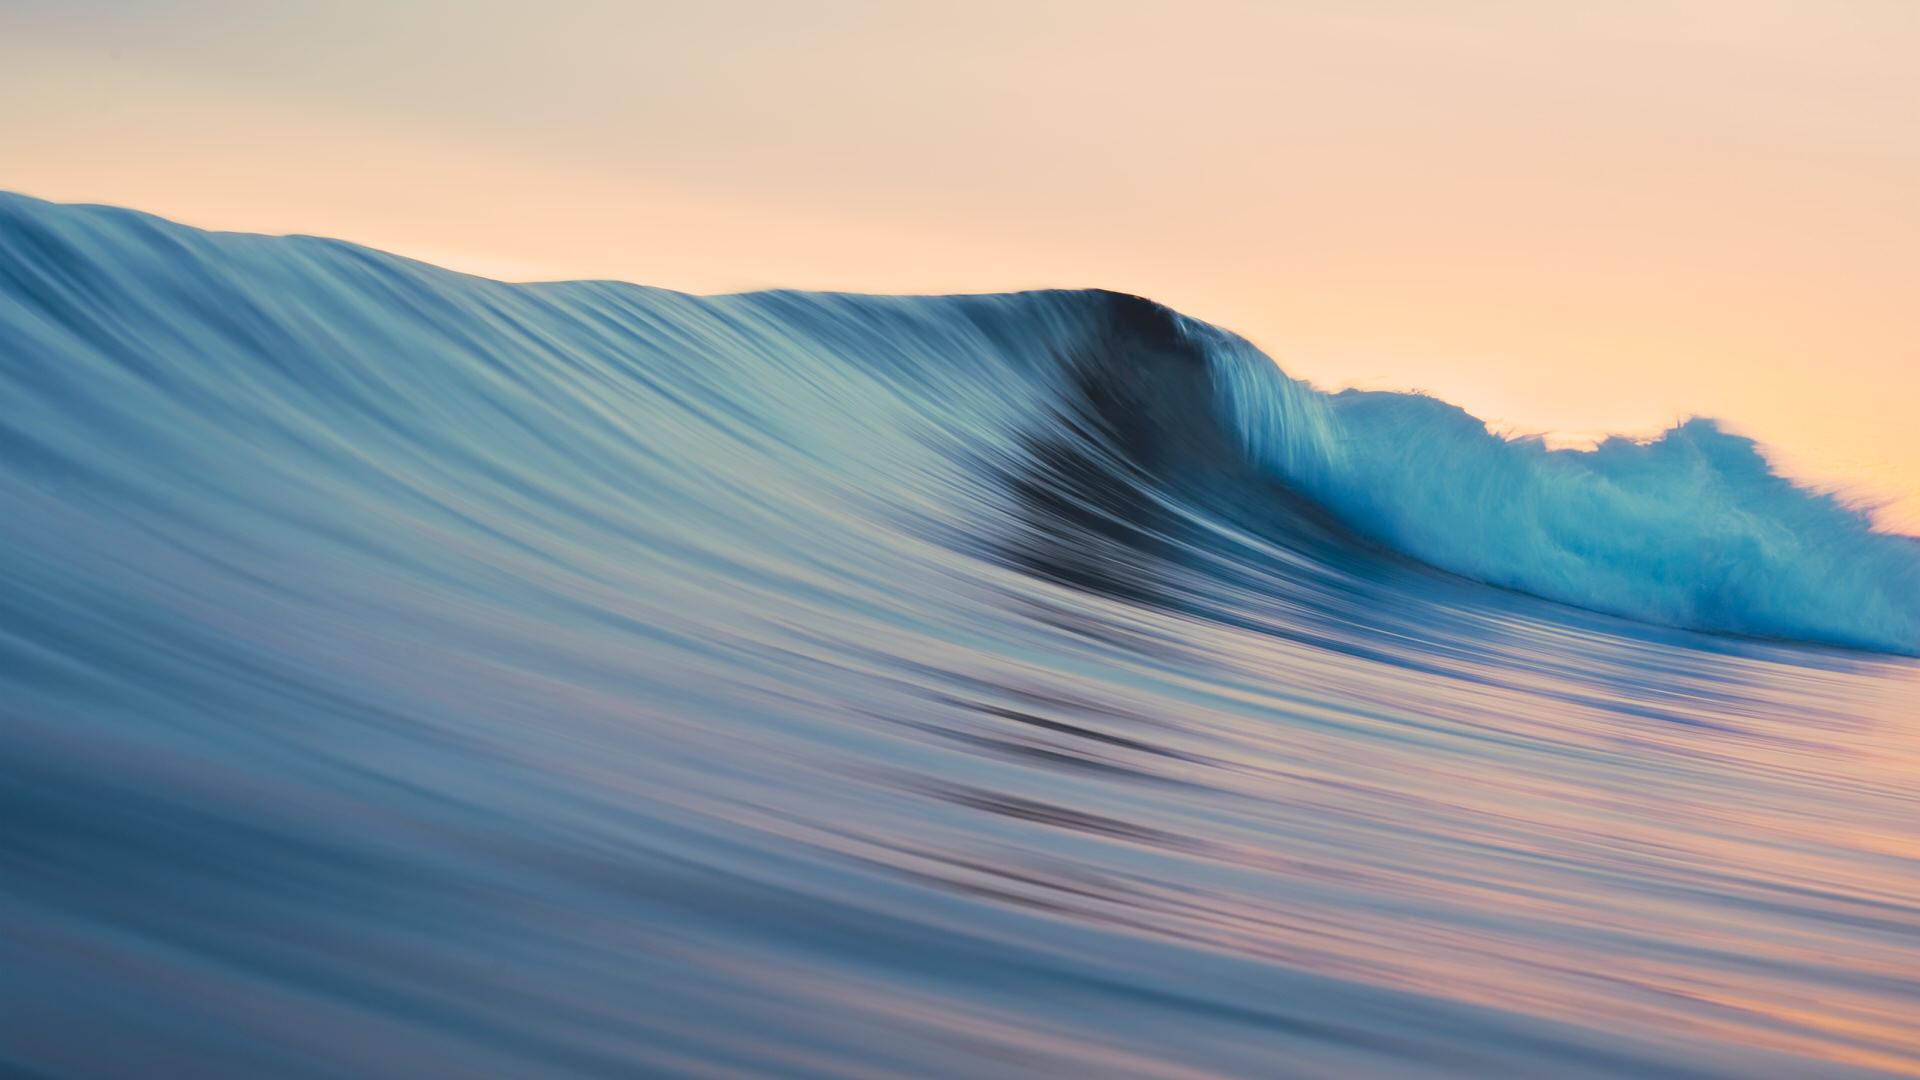 macOS Mavericks系统自带壁纸rolling waves高清壁纸